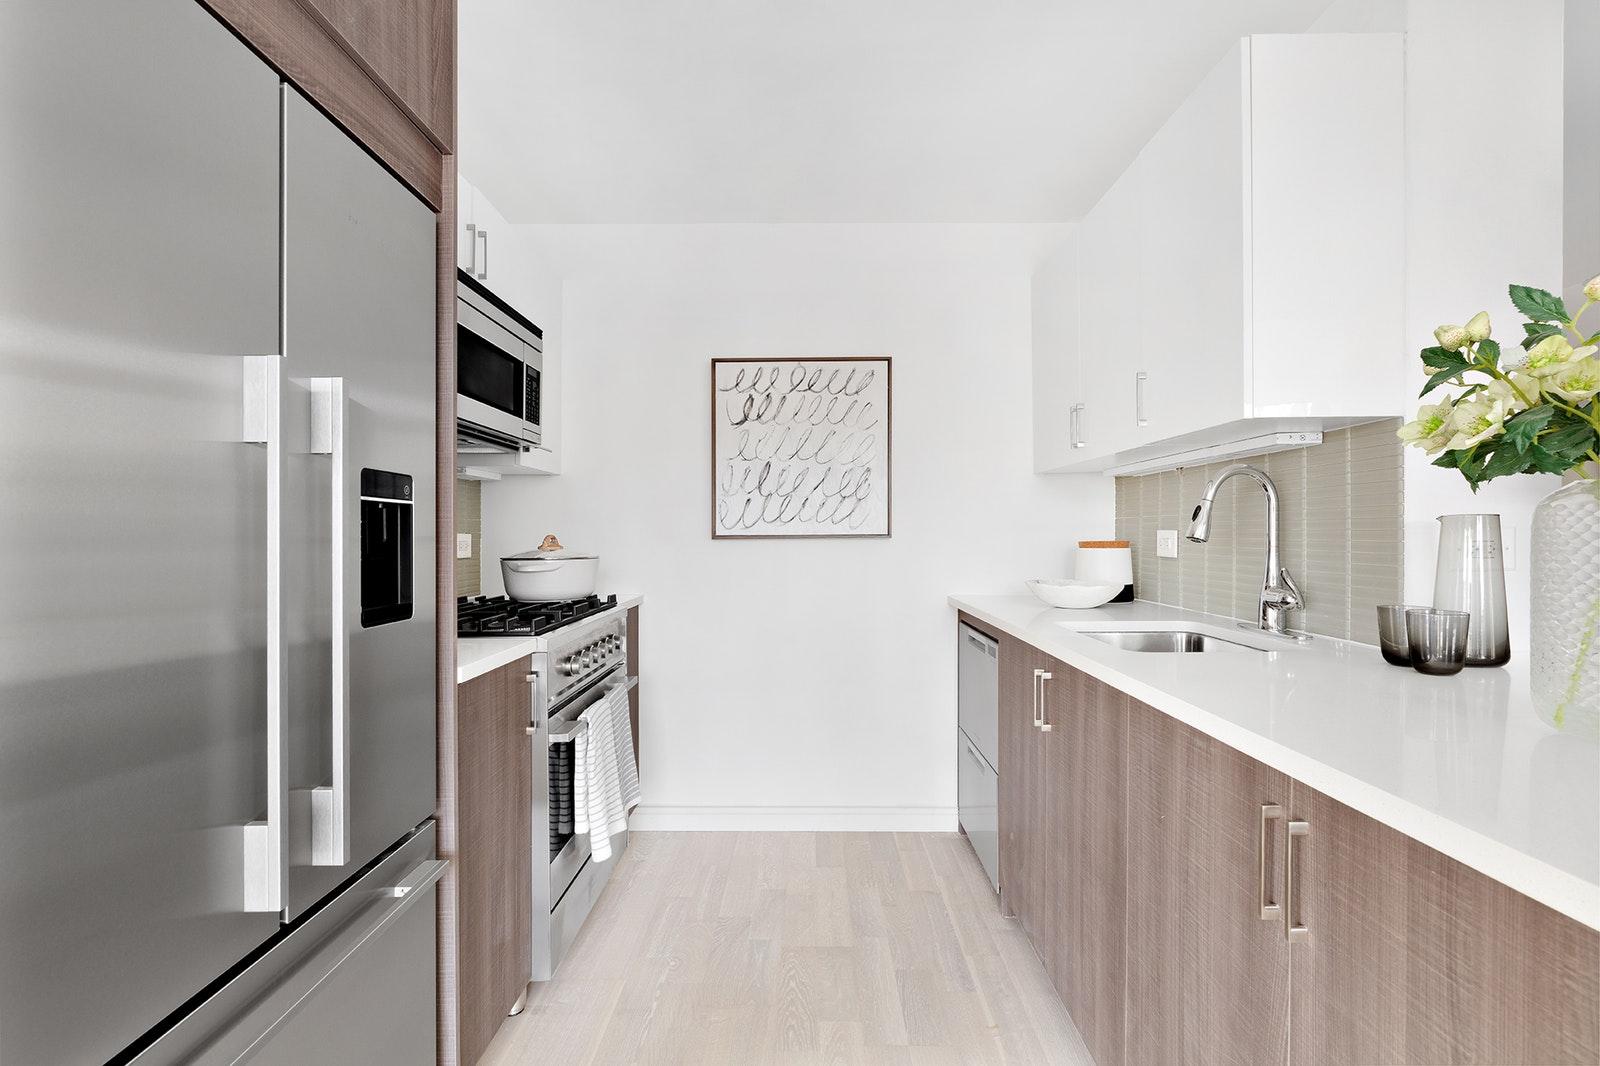 2351 ADAM CLAYTON POWELL PH14, Harlem, $995,000, Web #: 20074491